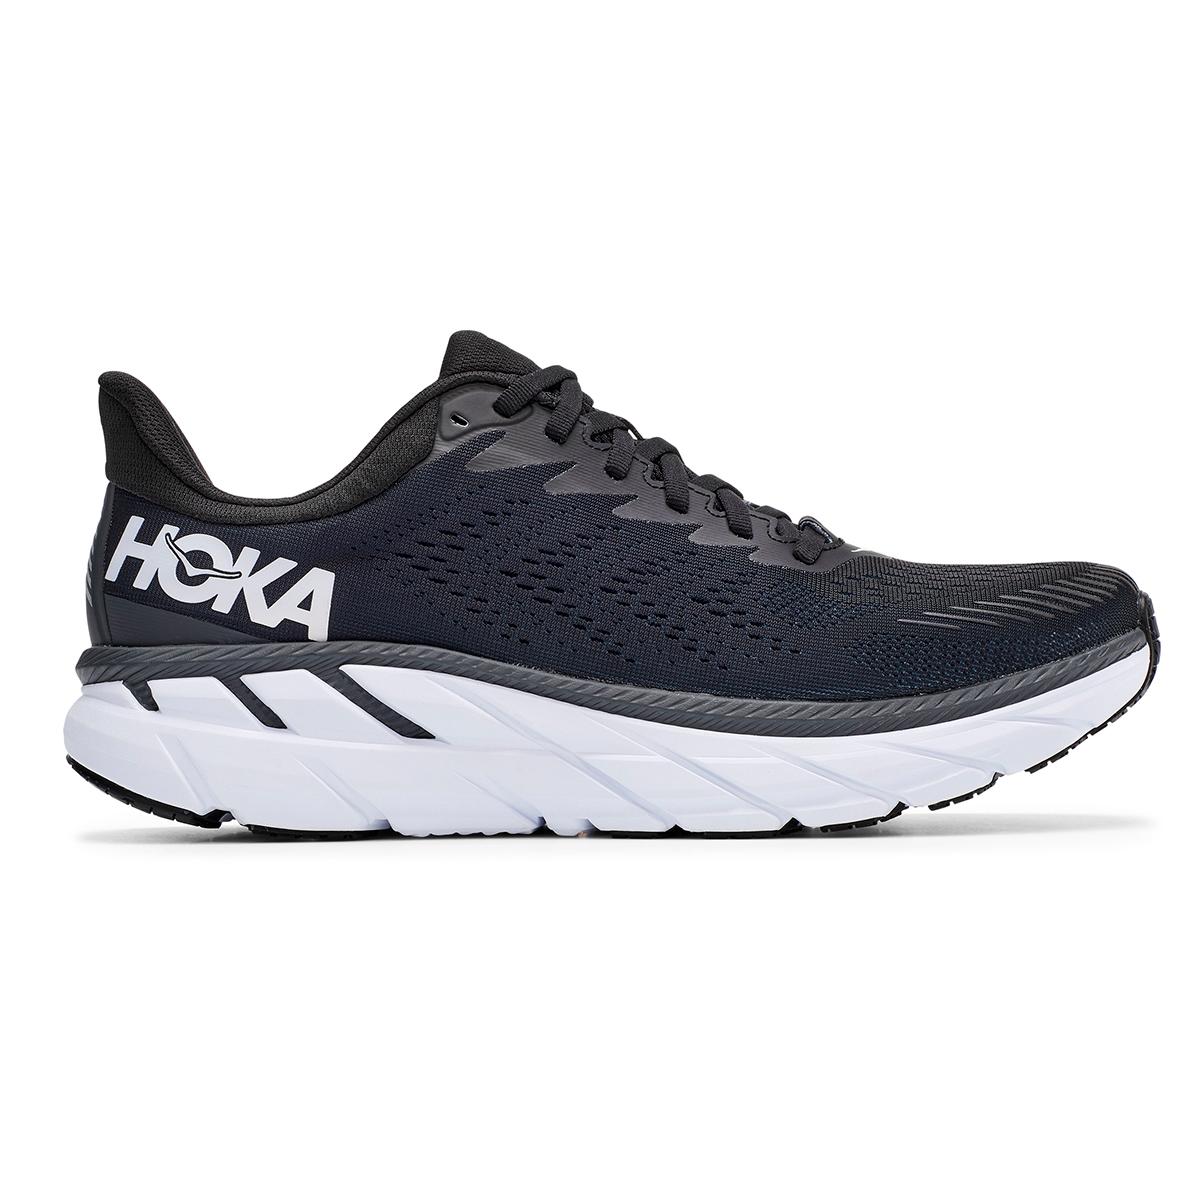 Hoka One One Clifton 7 Running Shoes $85.50 + Free S/H at JackRabbit